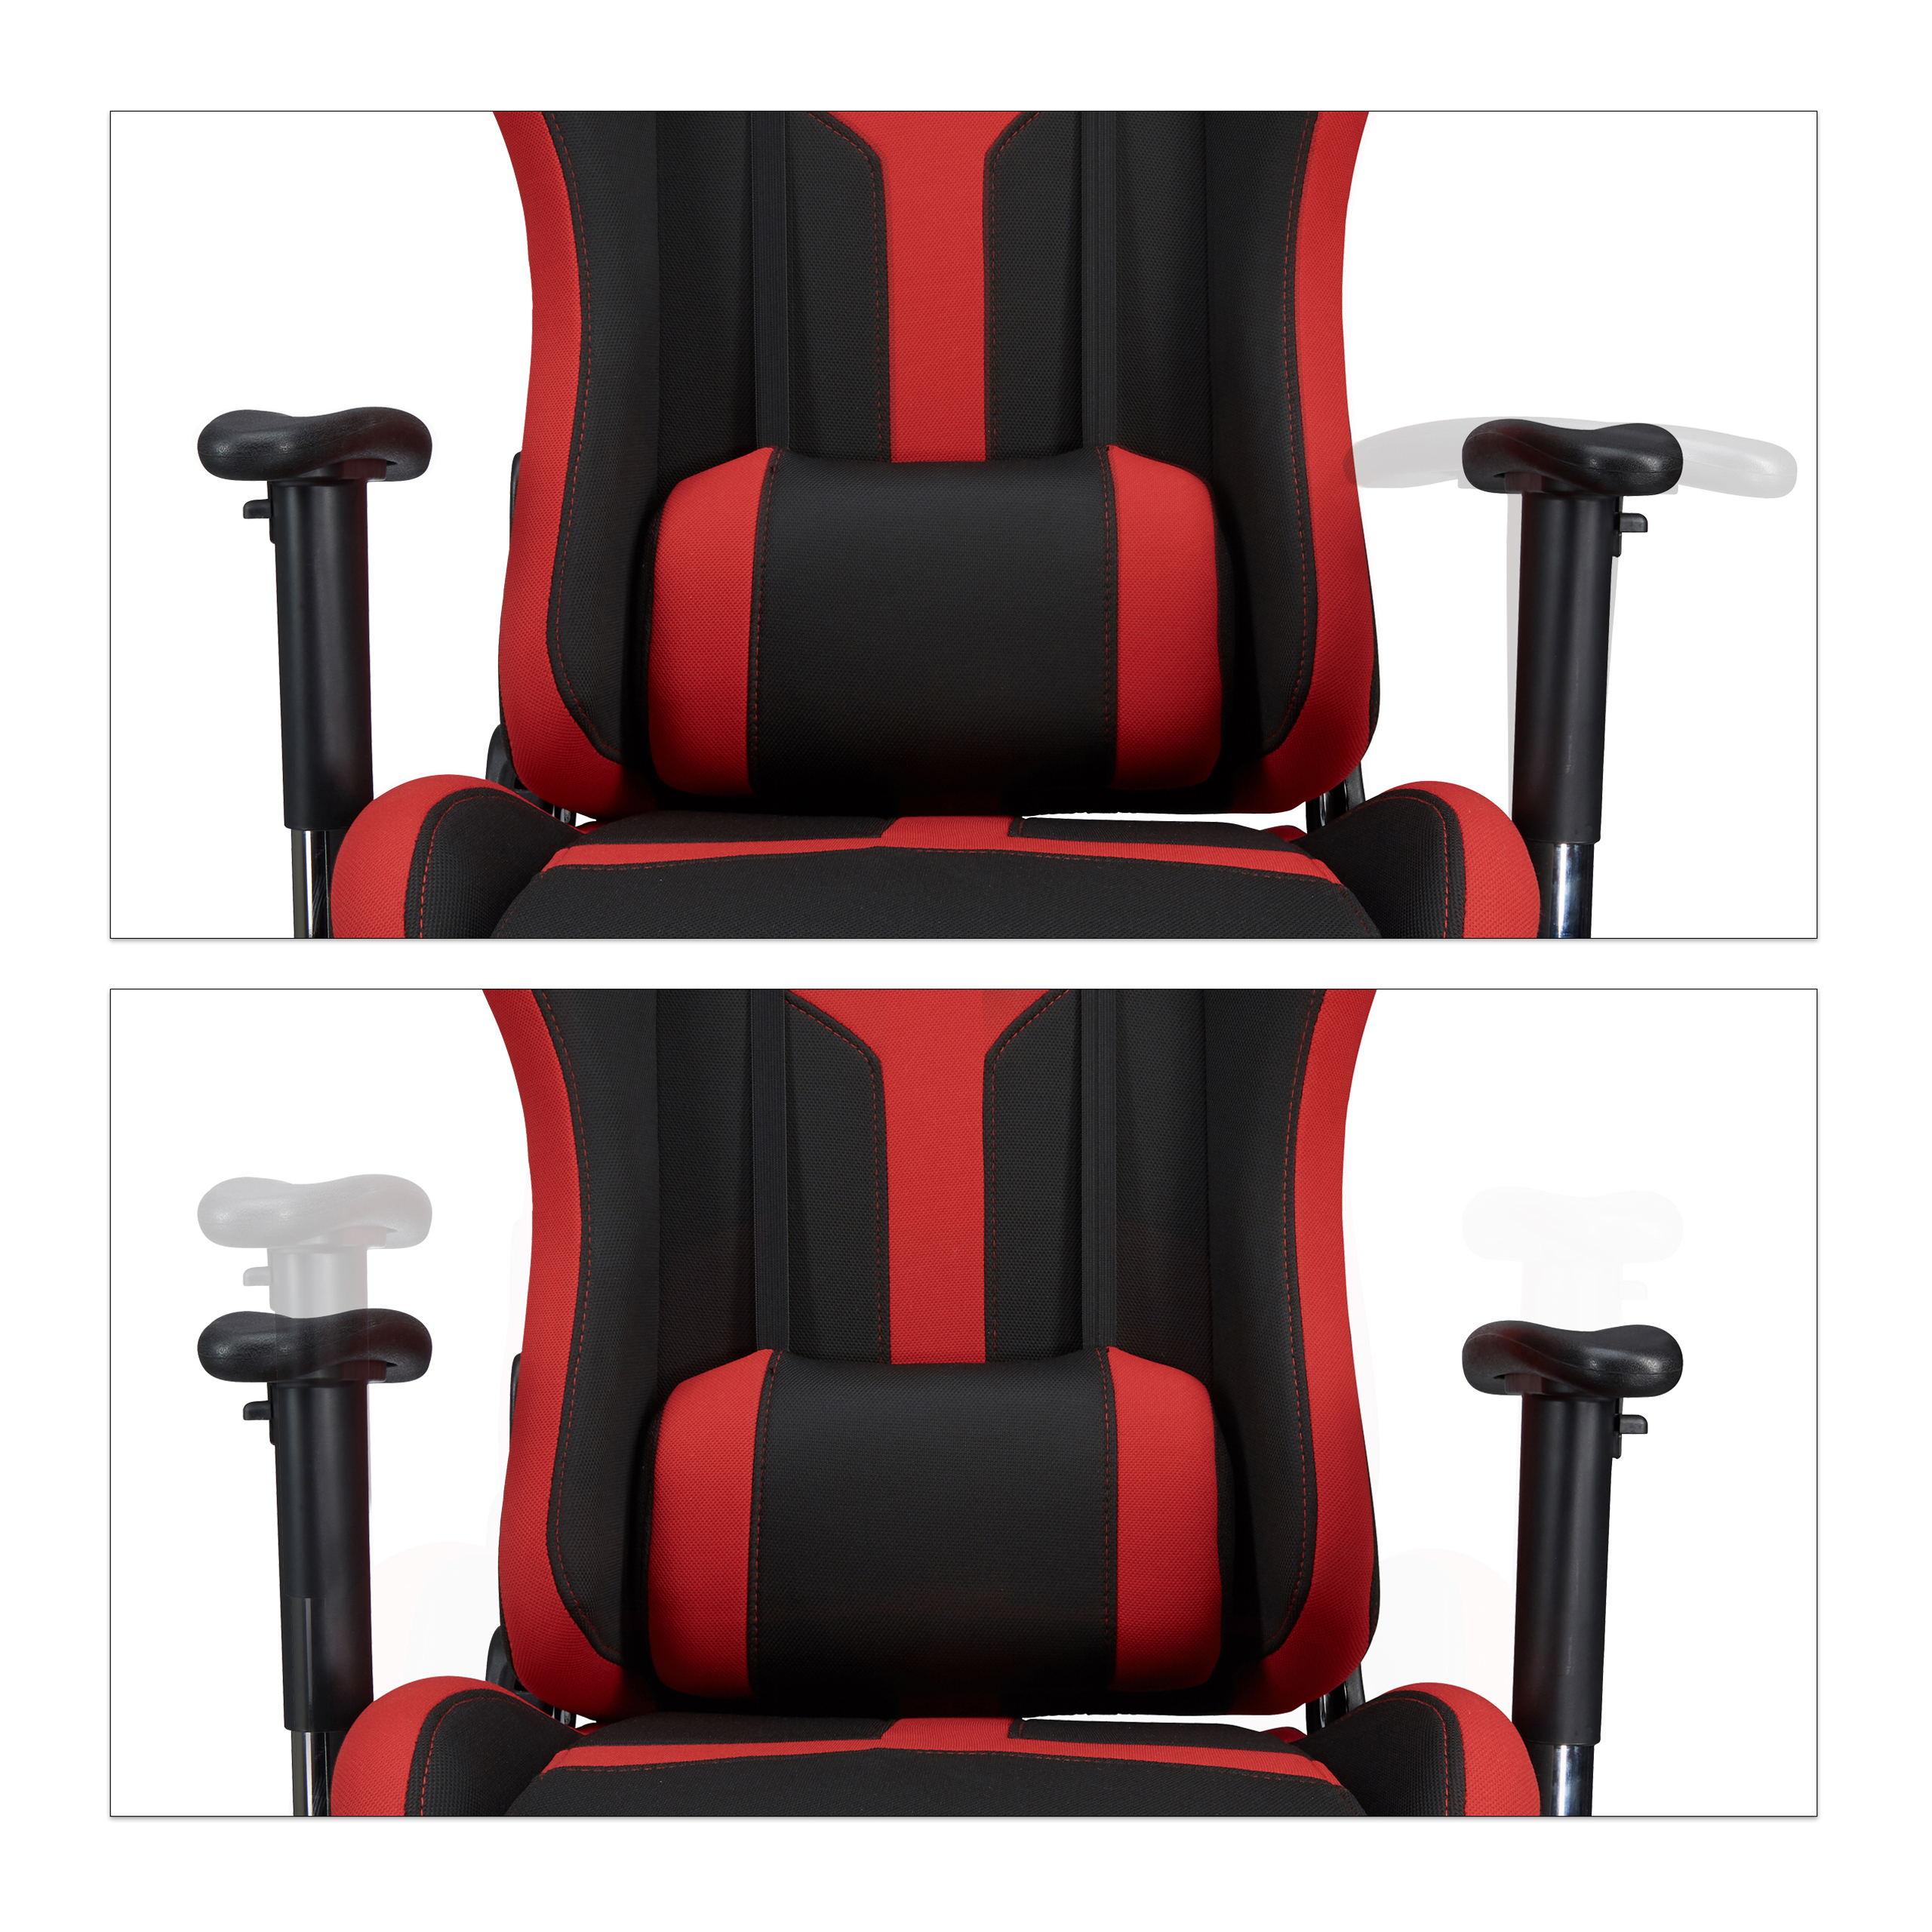 gaming stuhl xr10 drehstuhl chefsessel gamer stuhl b rostuhl racing stuhl ebay. Black Bedroom Furniture Sets. Home Design Ideas